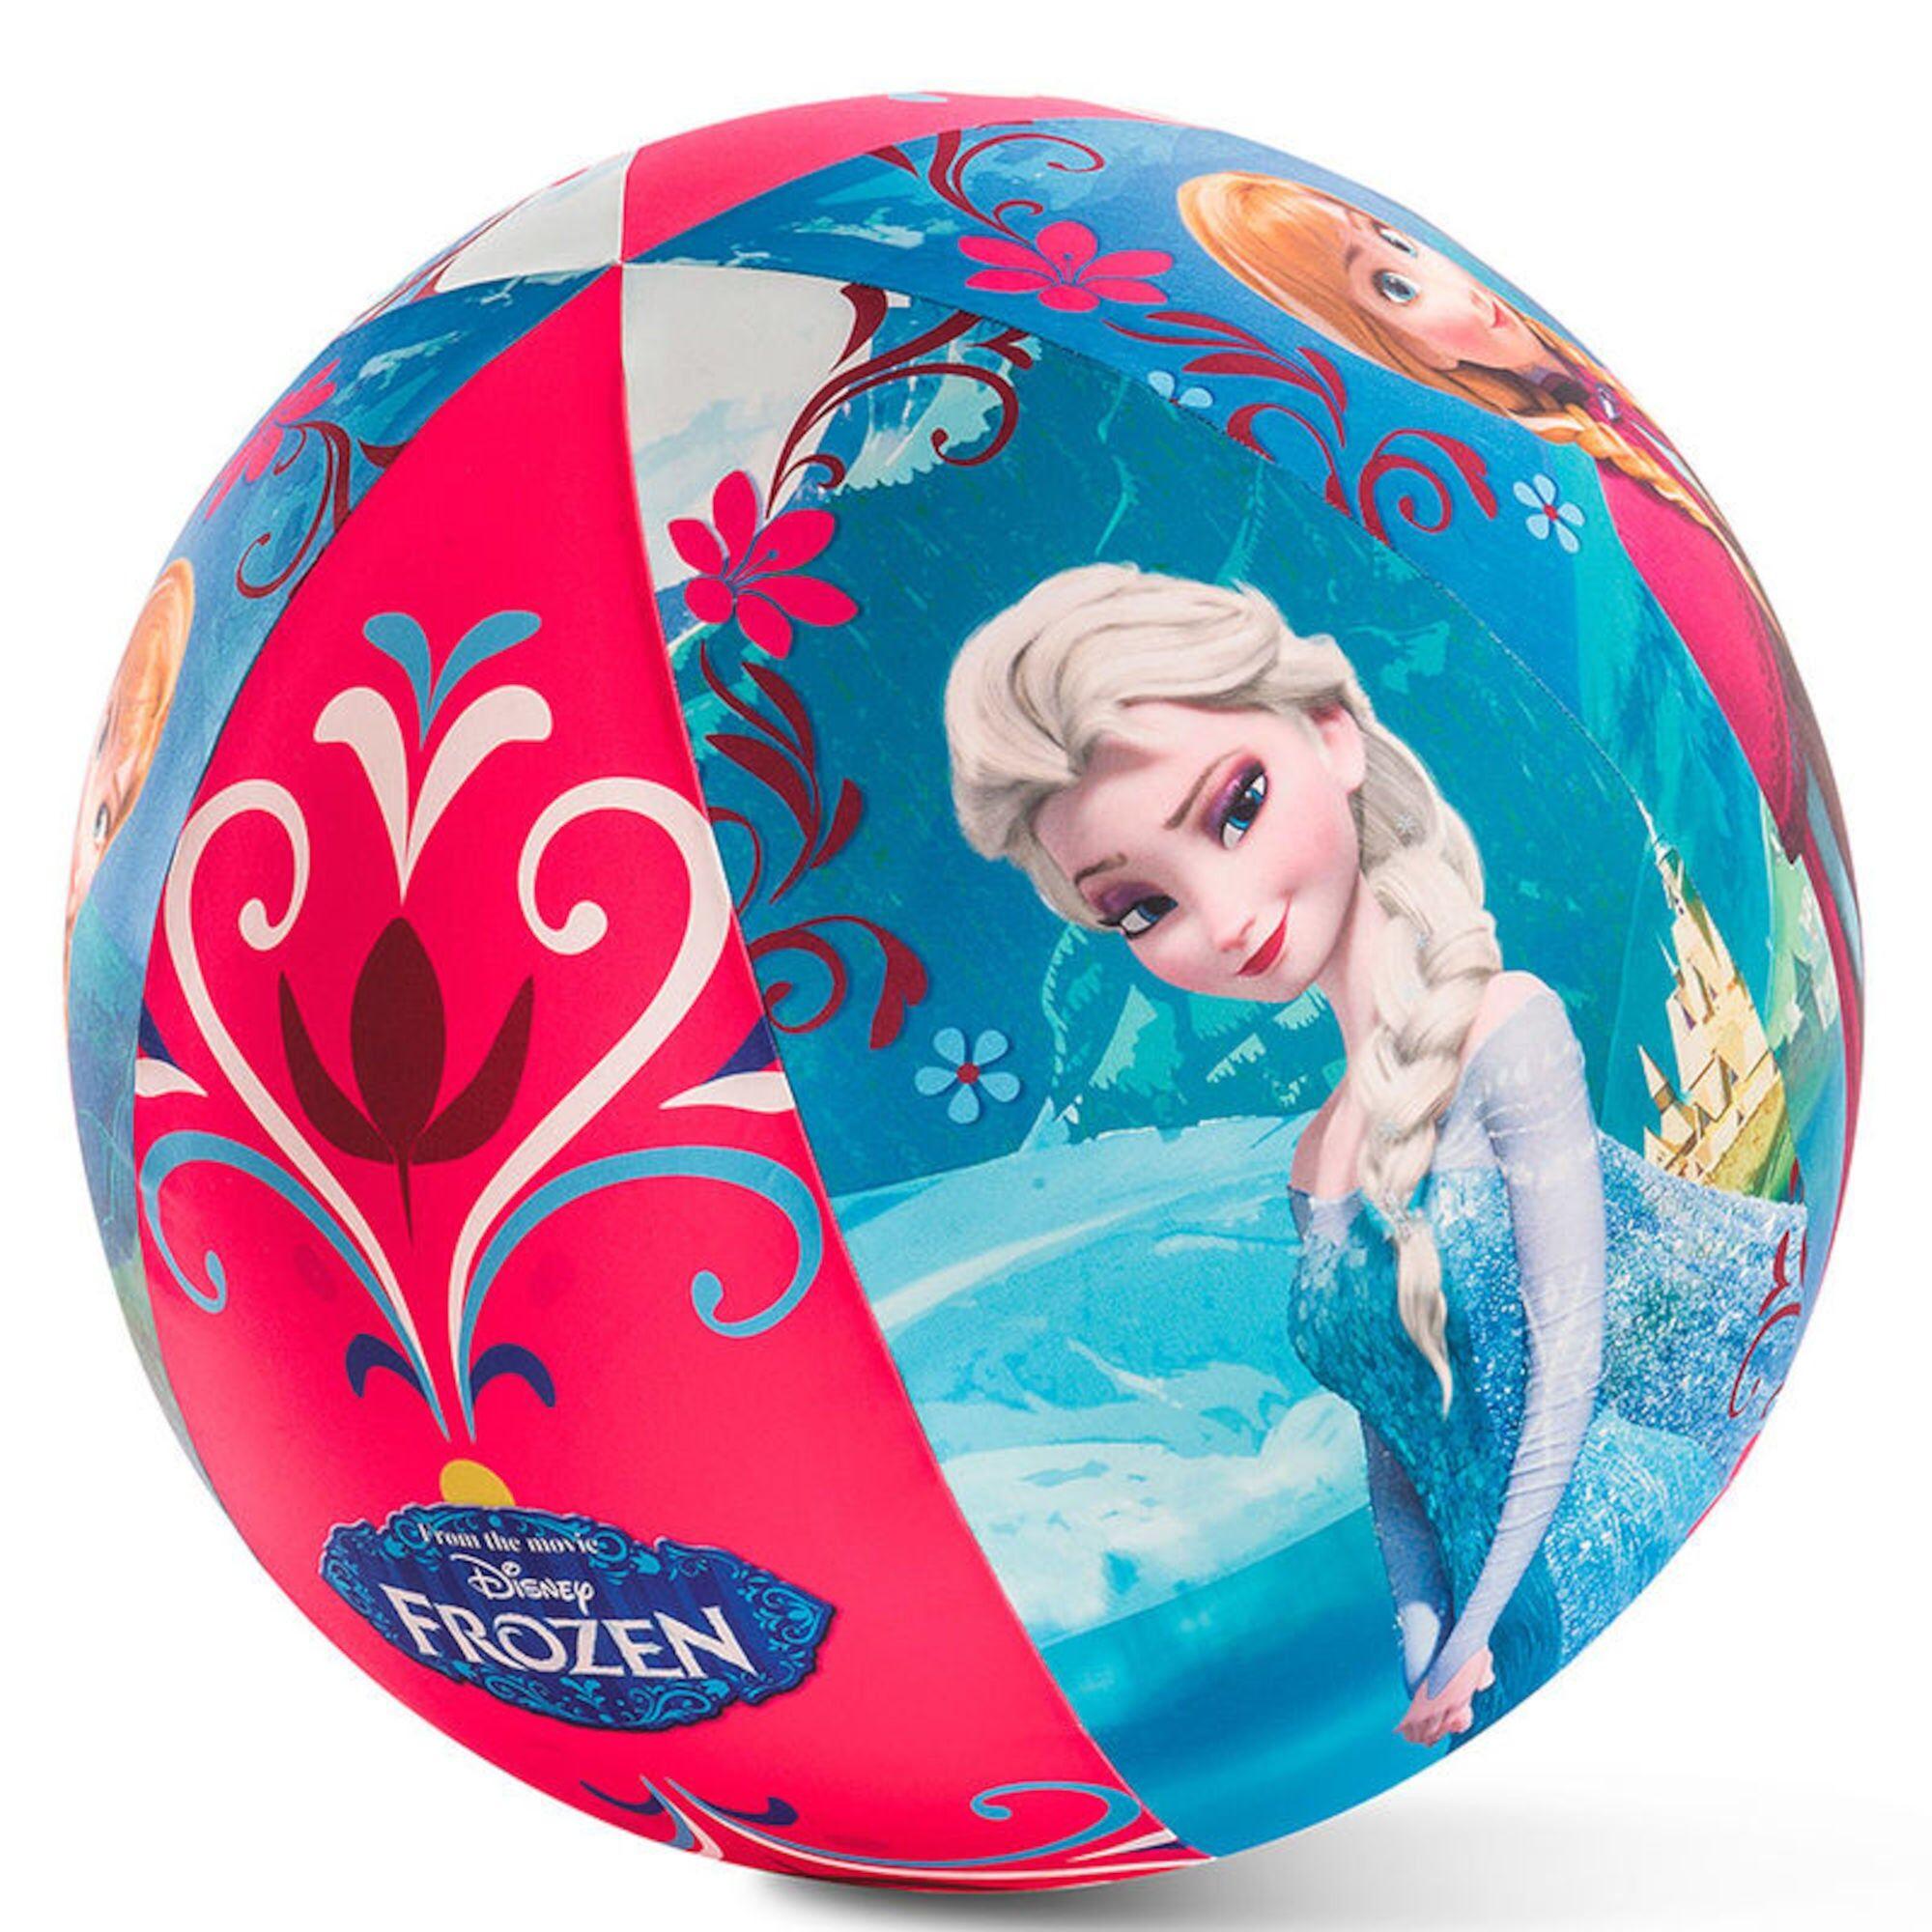 Disney Frozen Badeball